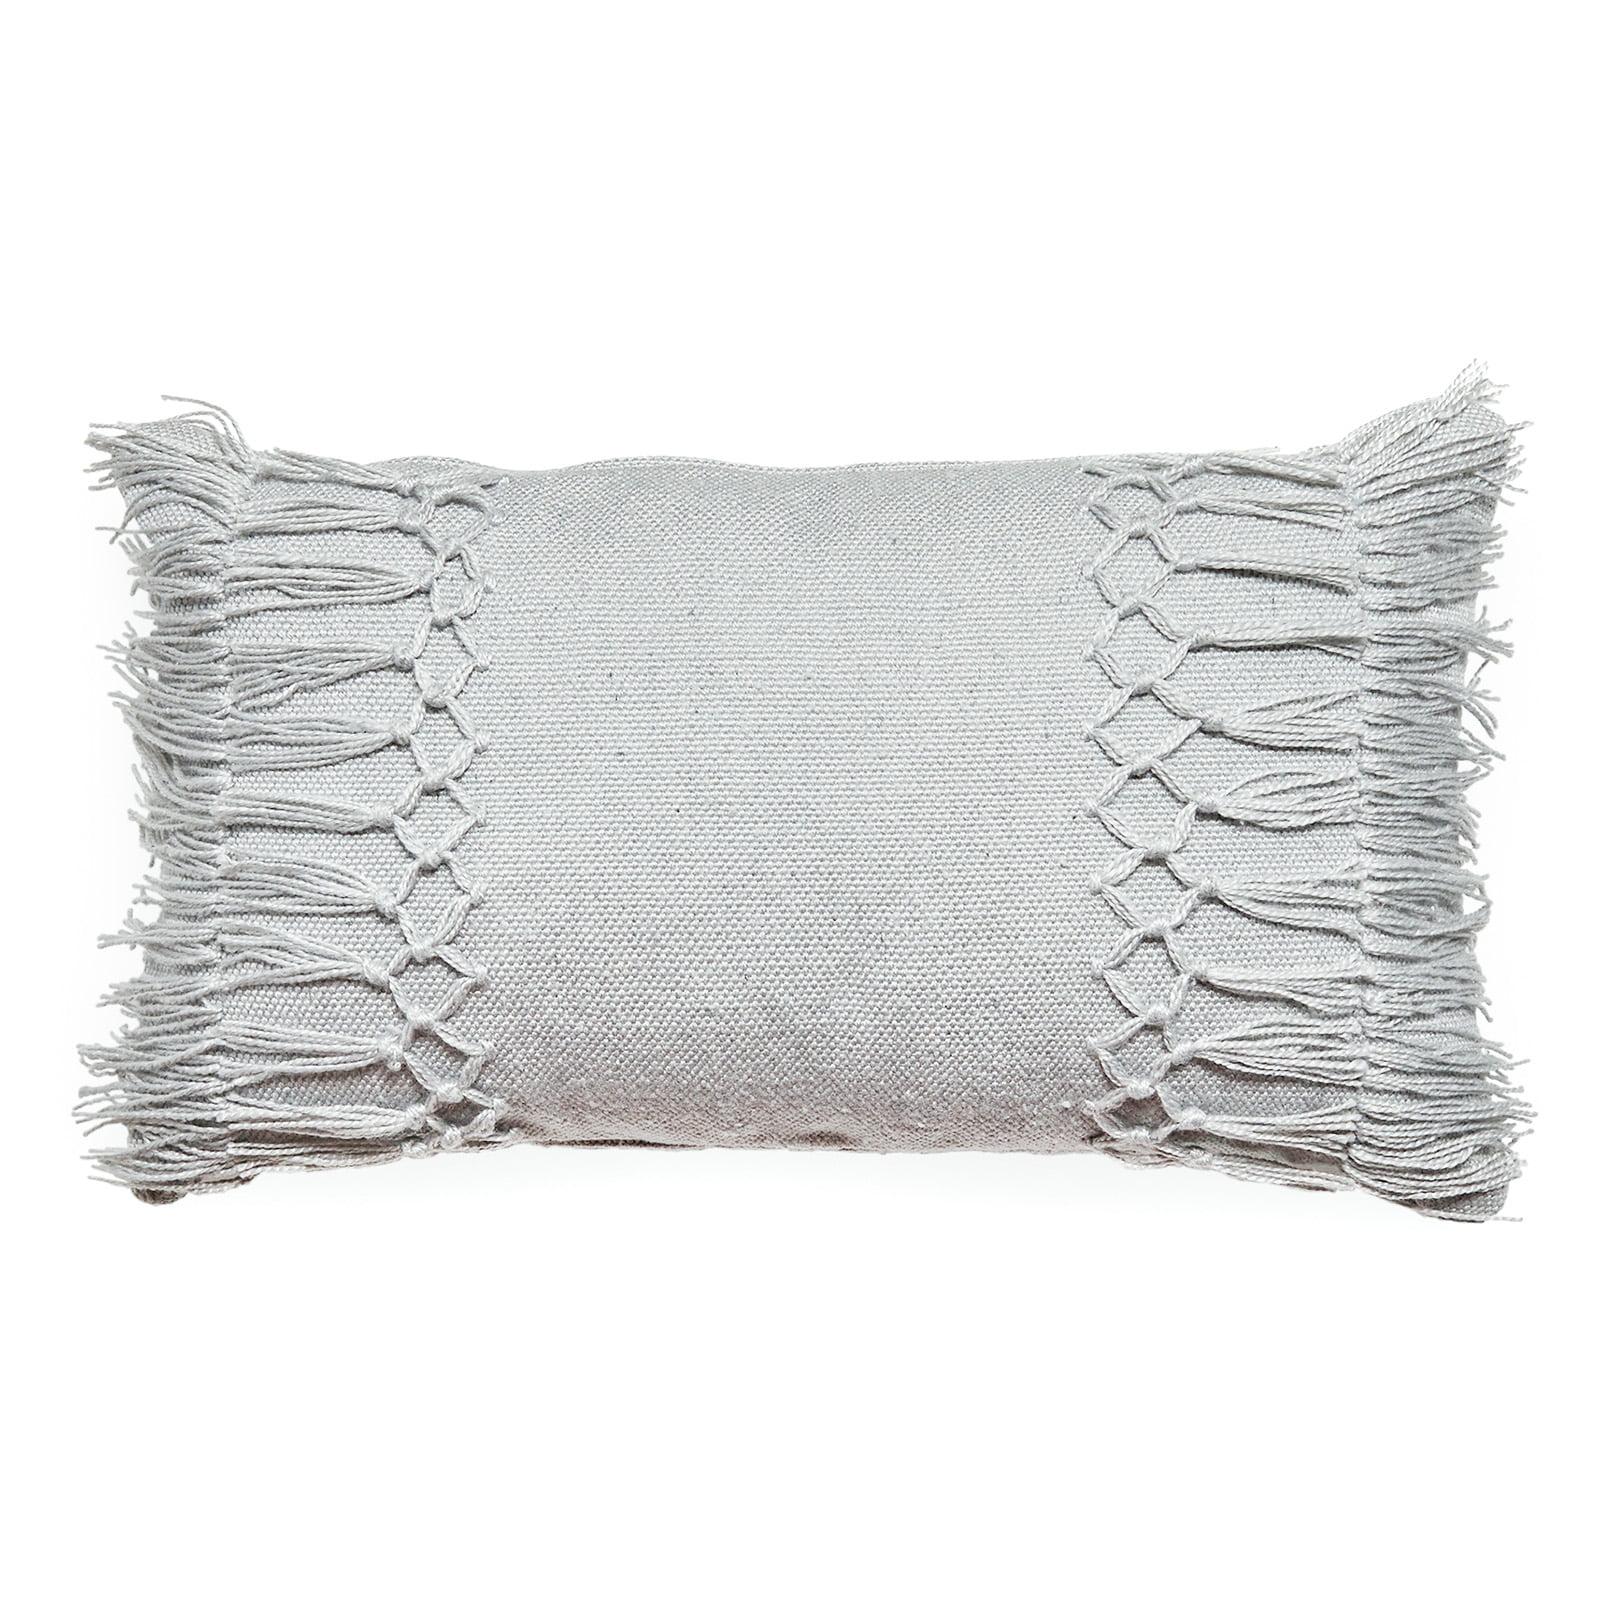 MoDRN 14in. x 24in. Textured Lumbar Outdoor Throw Pillow - Grey